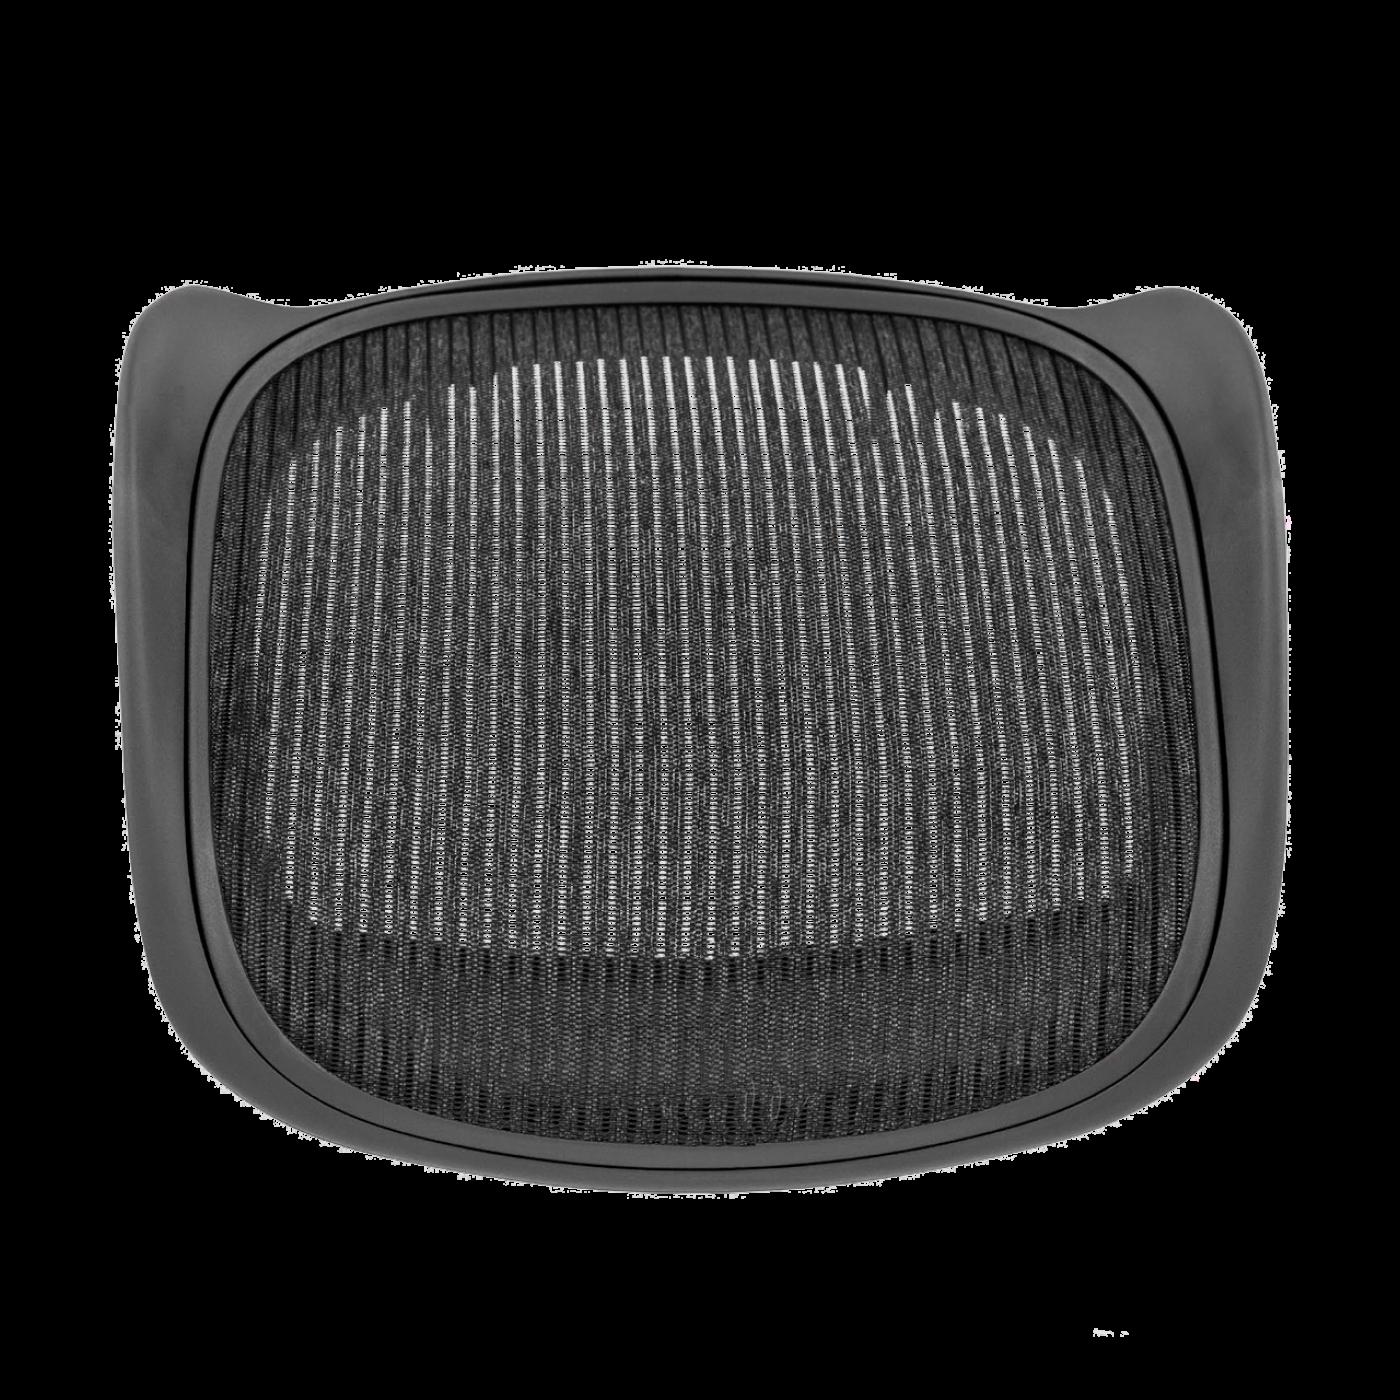 https://www.valueshop.dk/media/catalog/product/h/m/hm_aeron_seatpan_800x600.gif